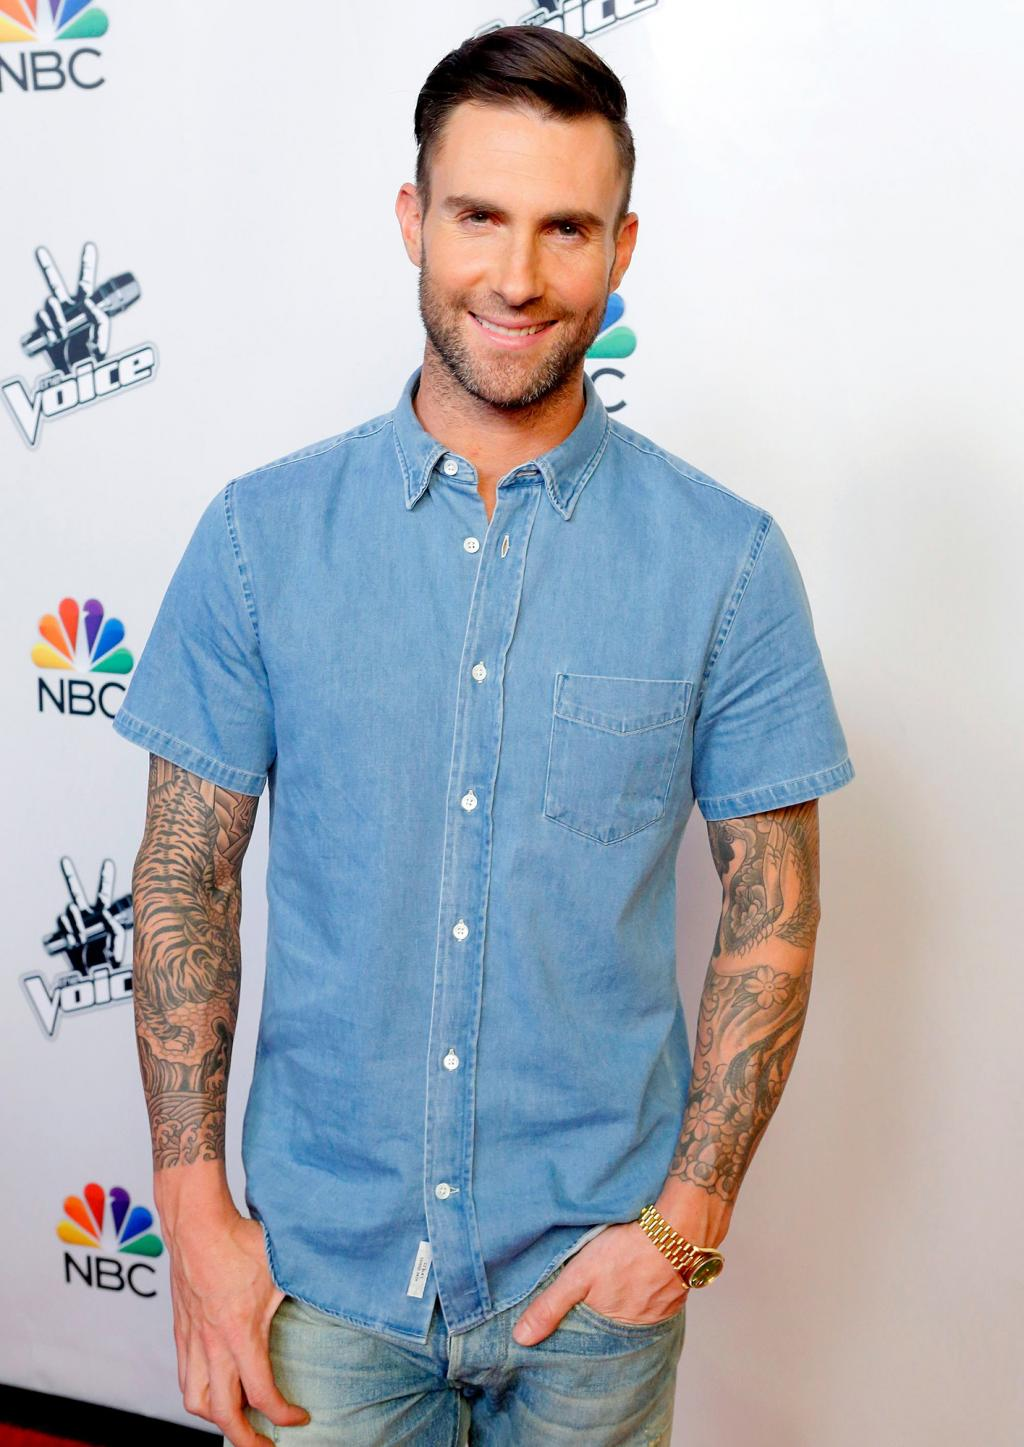 Blake Shelton, Gwen Stefani, Adam Levine and Alicia Keys Are Rowdy Roommates in The Voice's Season 12 Promo